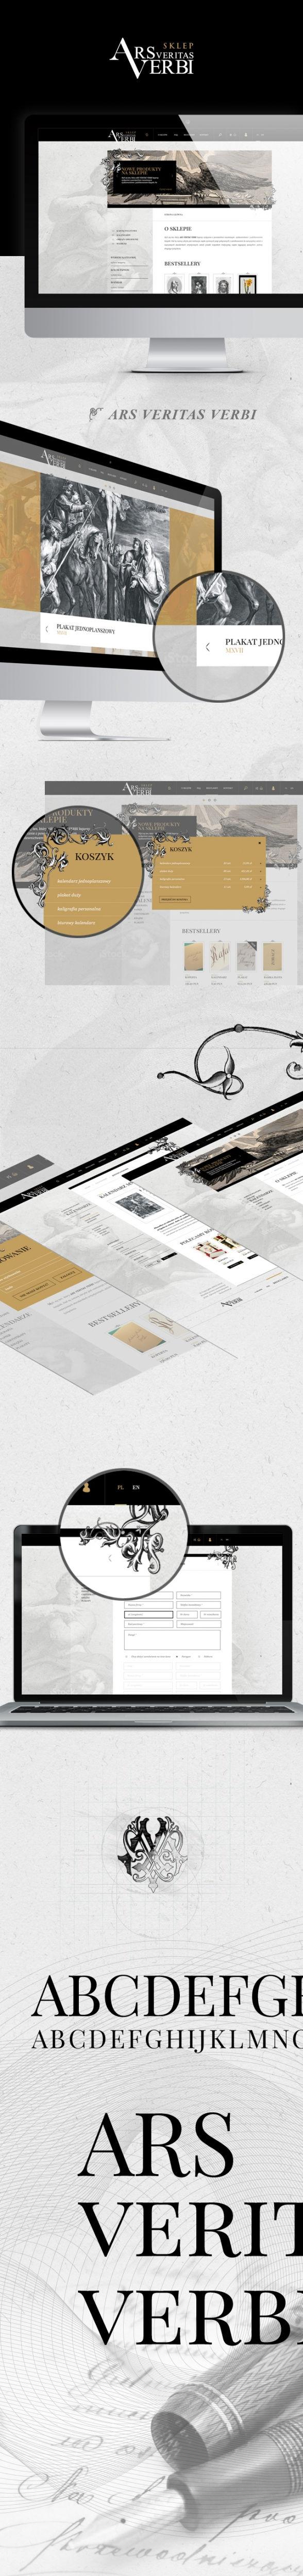 Sklep on-line, logo Ars Veritas Verbi sklep  wydawnictwa